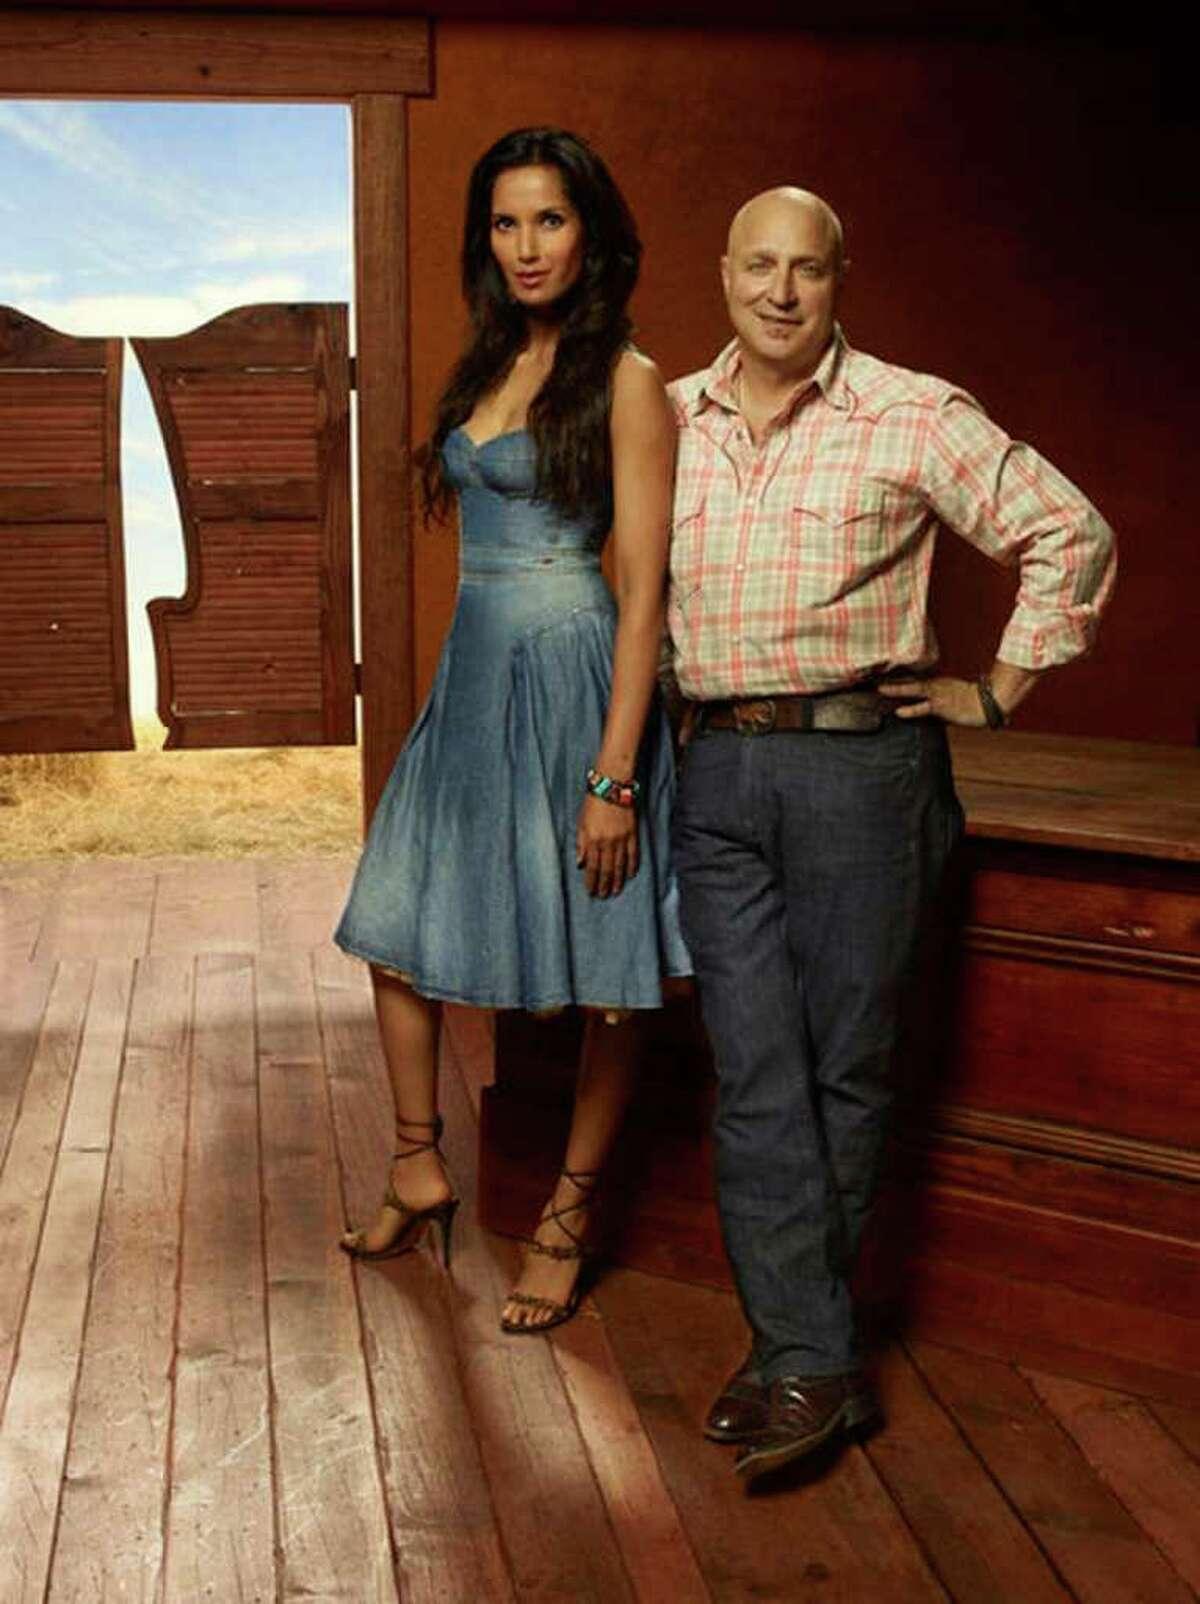 Season nine of Top Chef with Padma Lakshmi and Tom Colicchio had episodes shot in San Antonio.